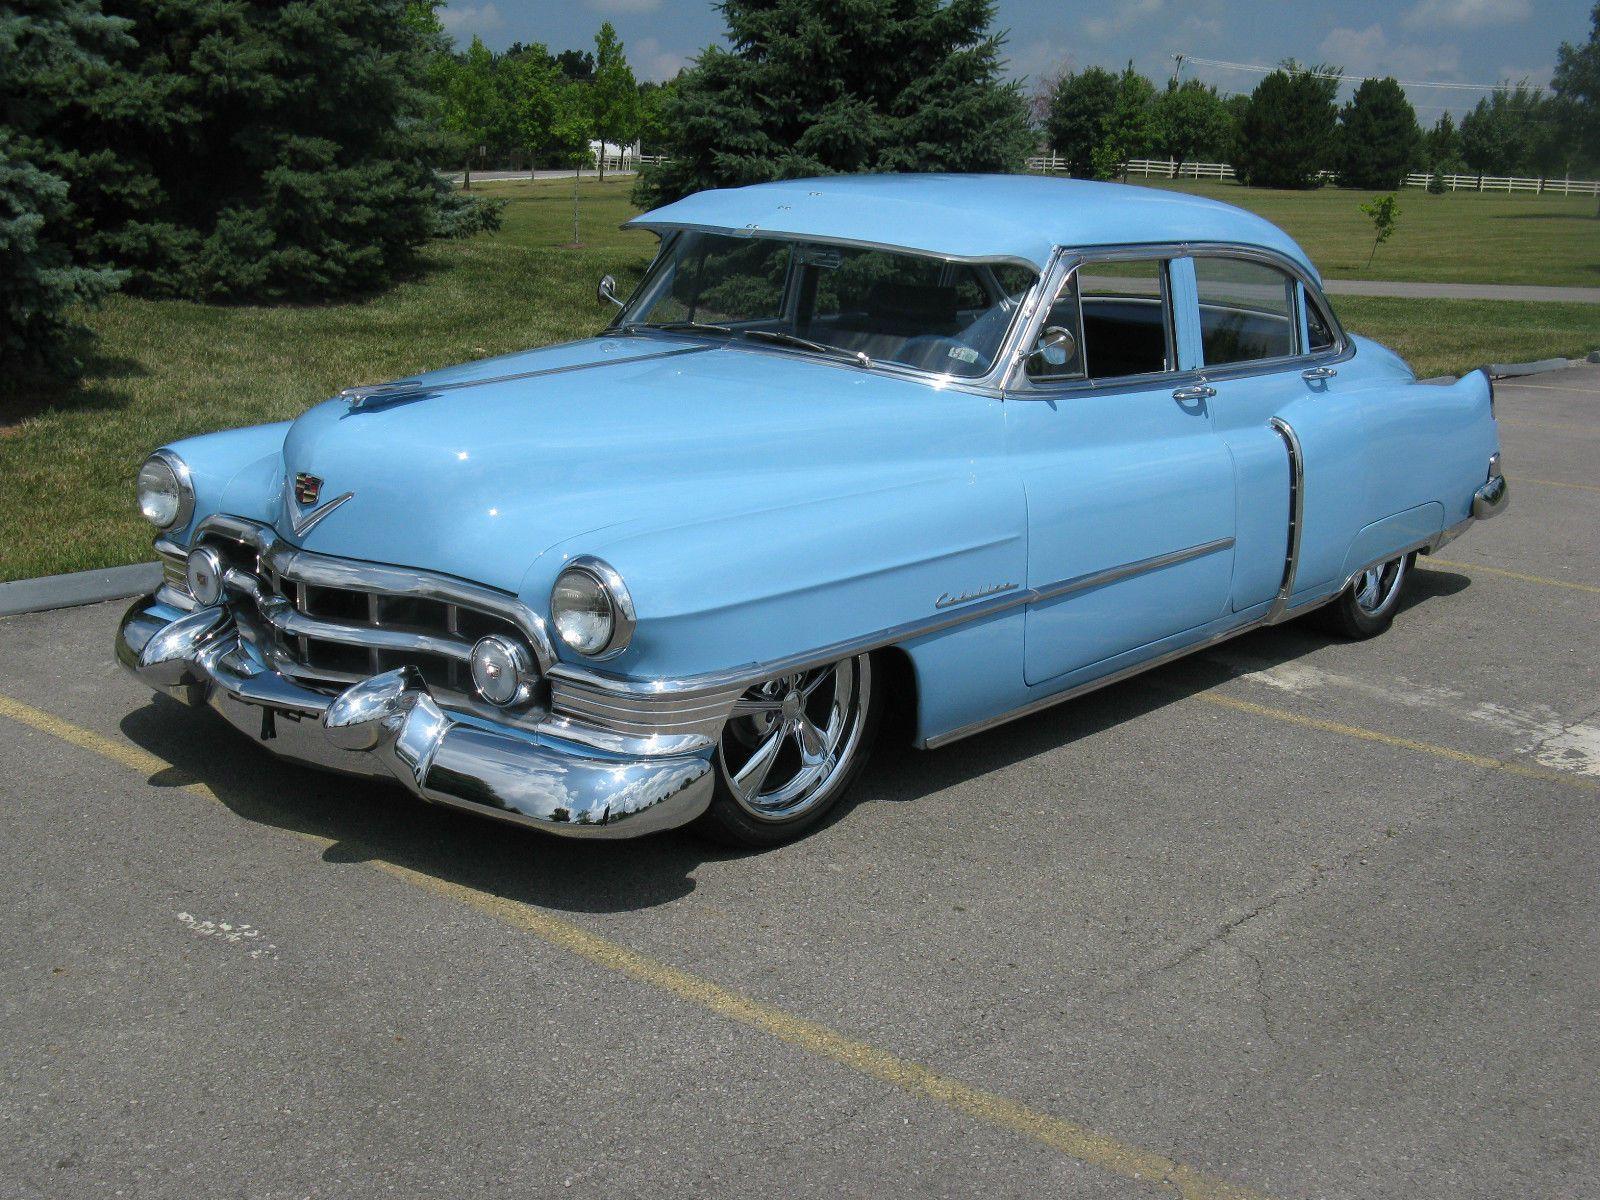 1951 Cadillac Series 62 Restomod Custom Cars For Sale Sedan Deville